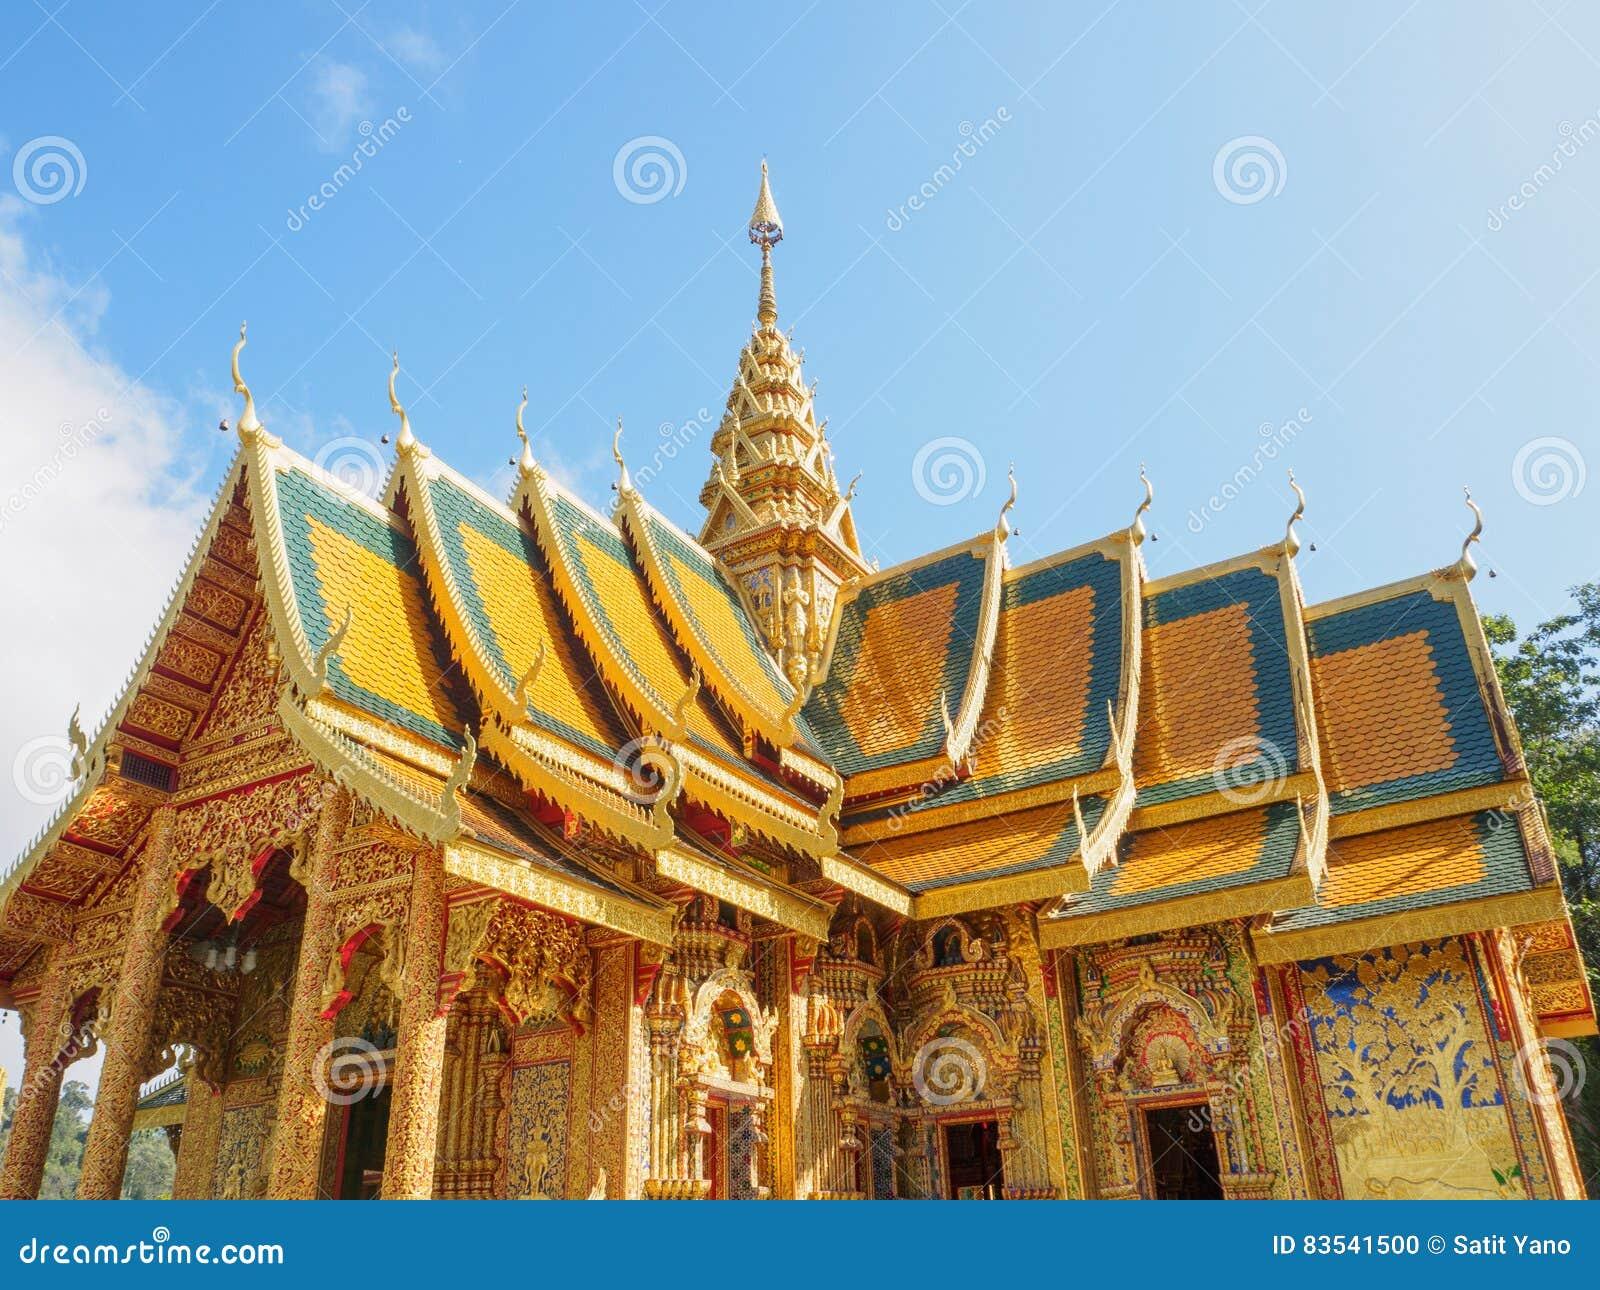 Buddhas four tracks stock photo image of buddhist exterior royalty free stock photo biocorpaavc Images